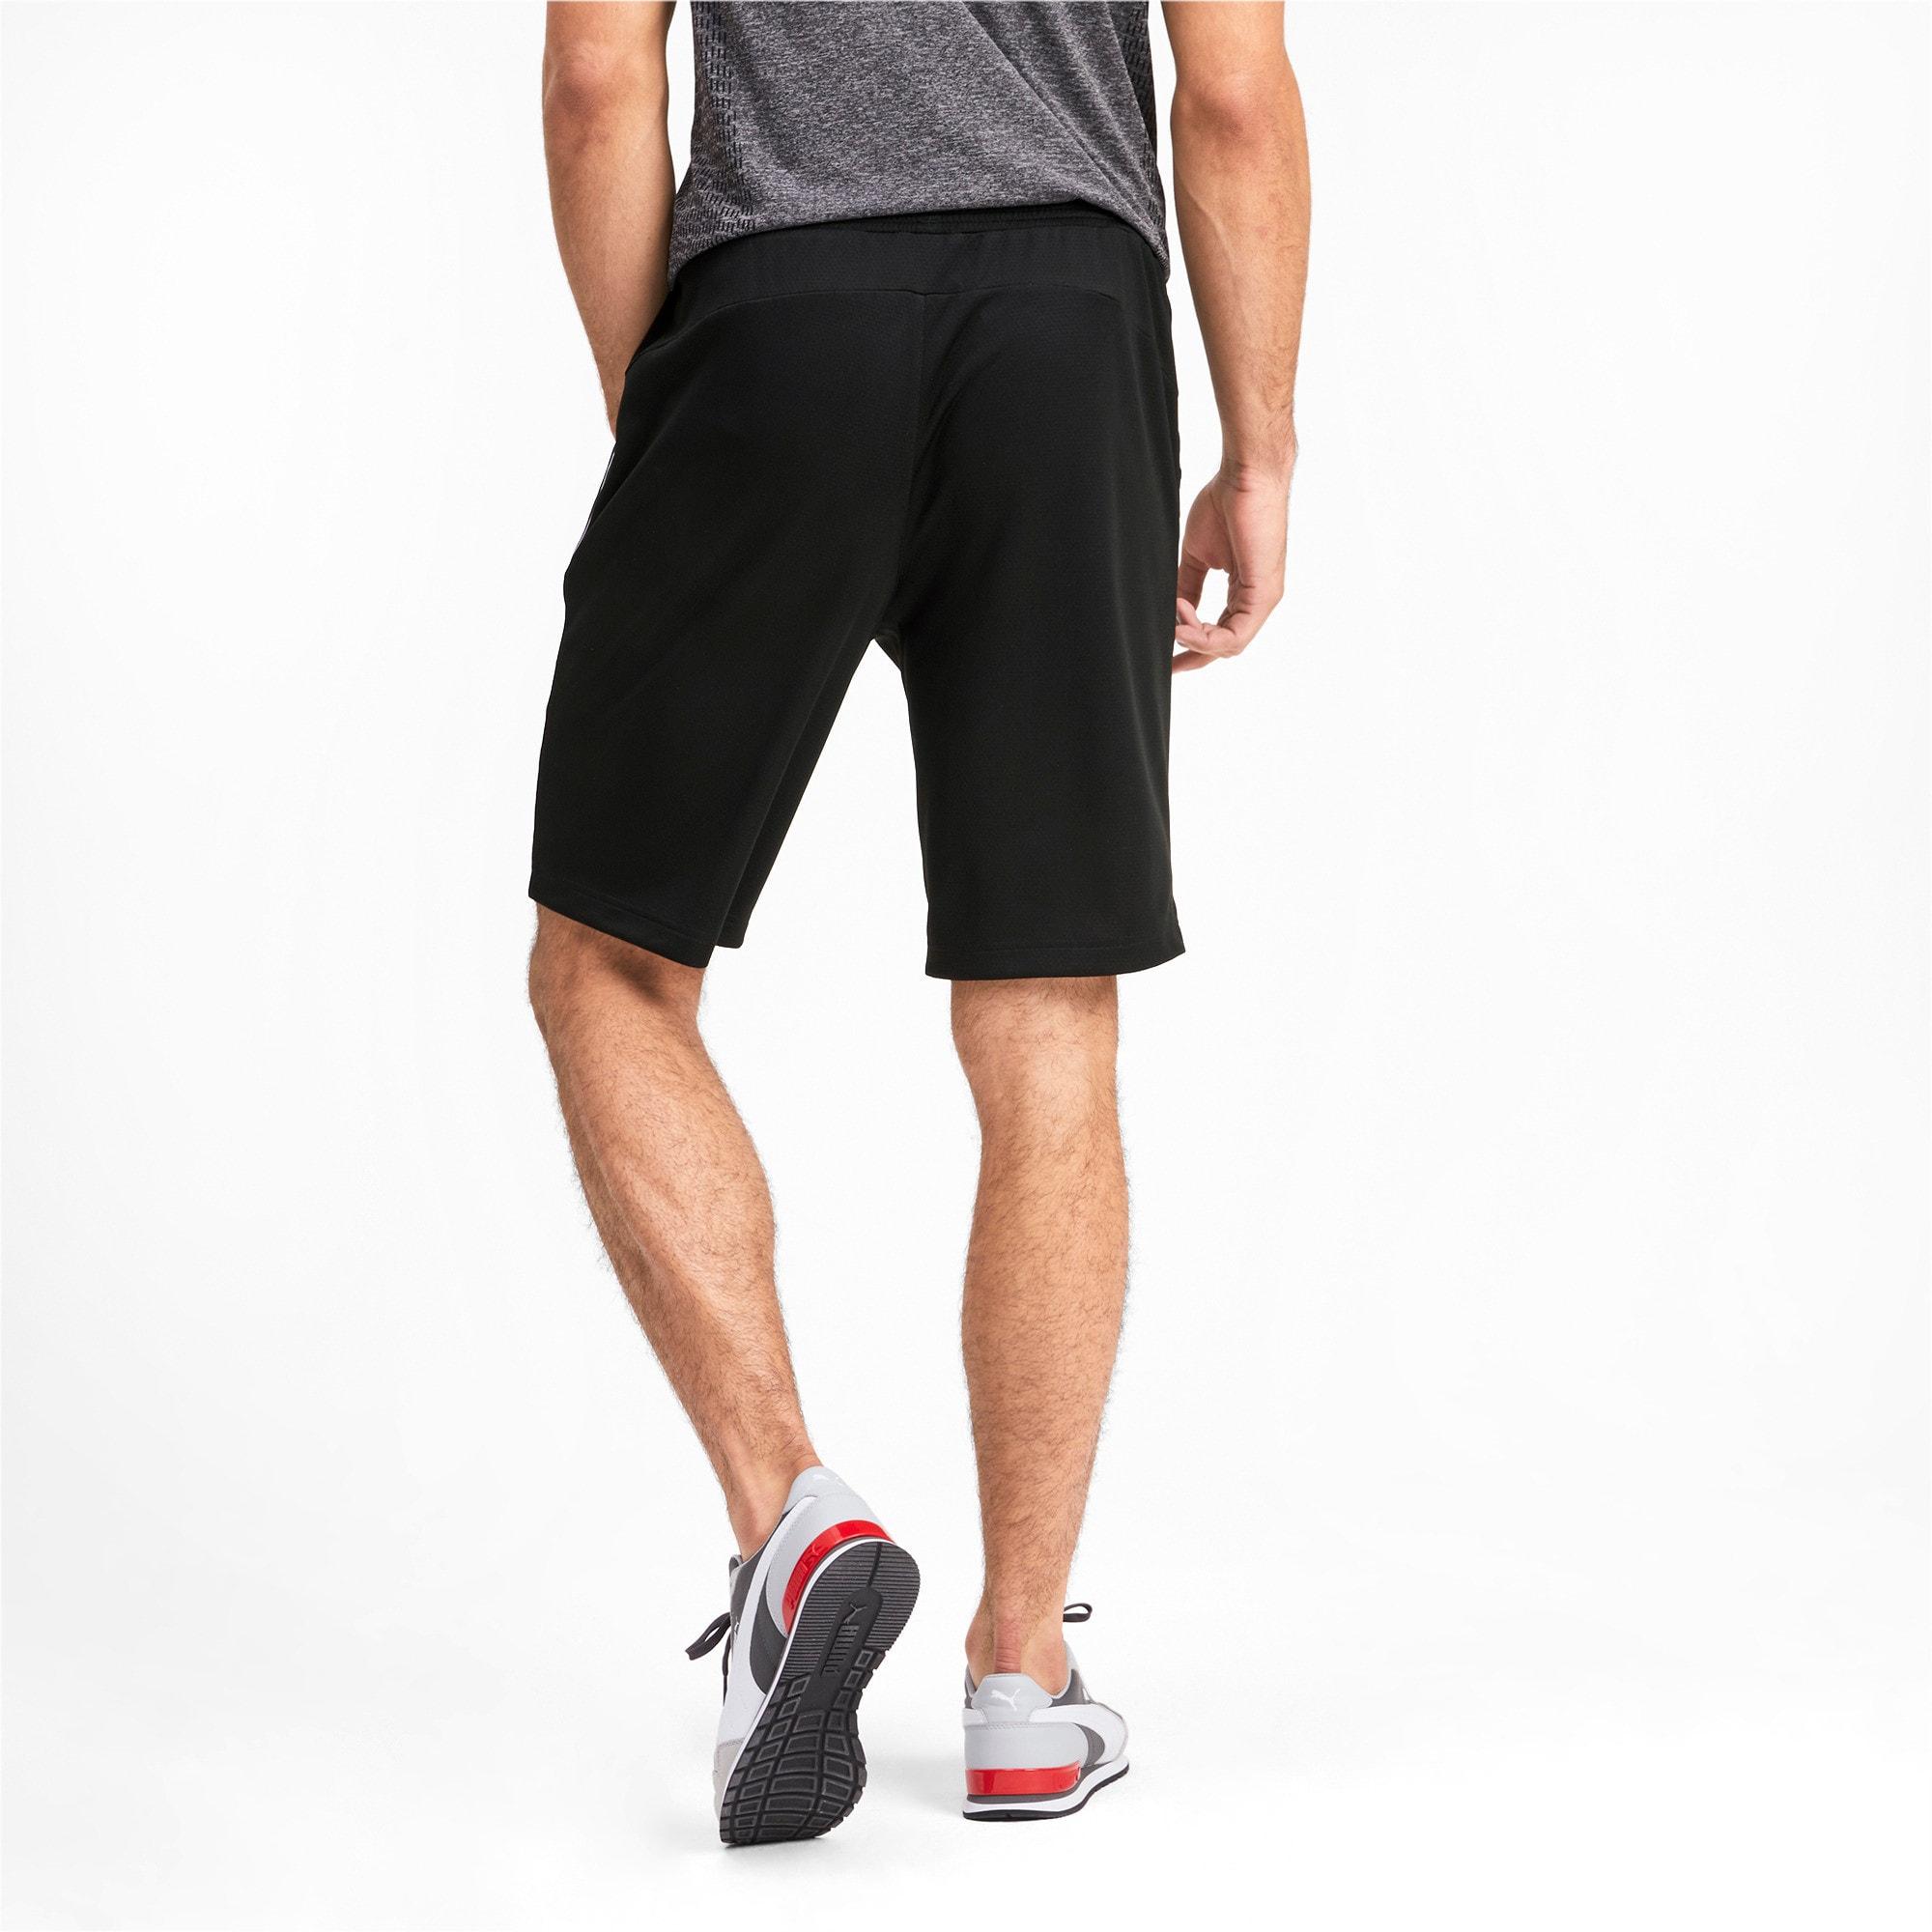 Thumbnail 2 of Tec Sports Interlock Men's Shorts, Puma Black, medium-IND